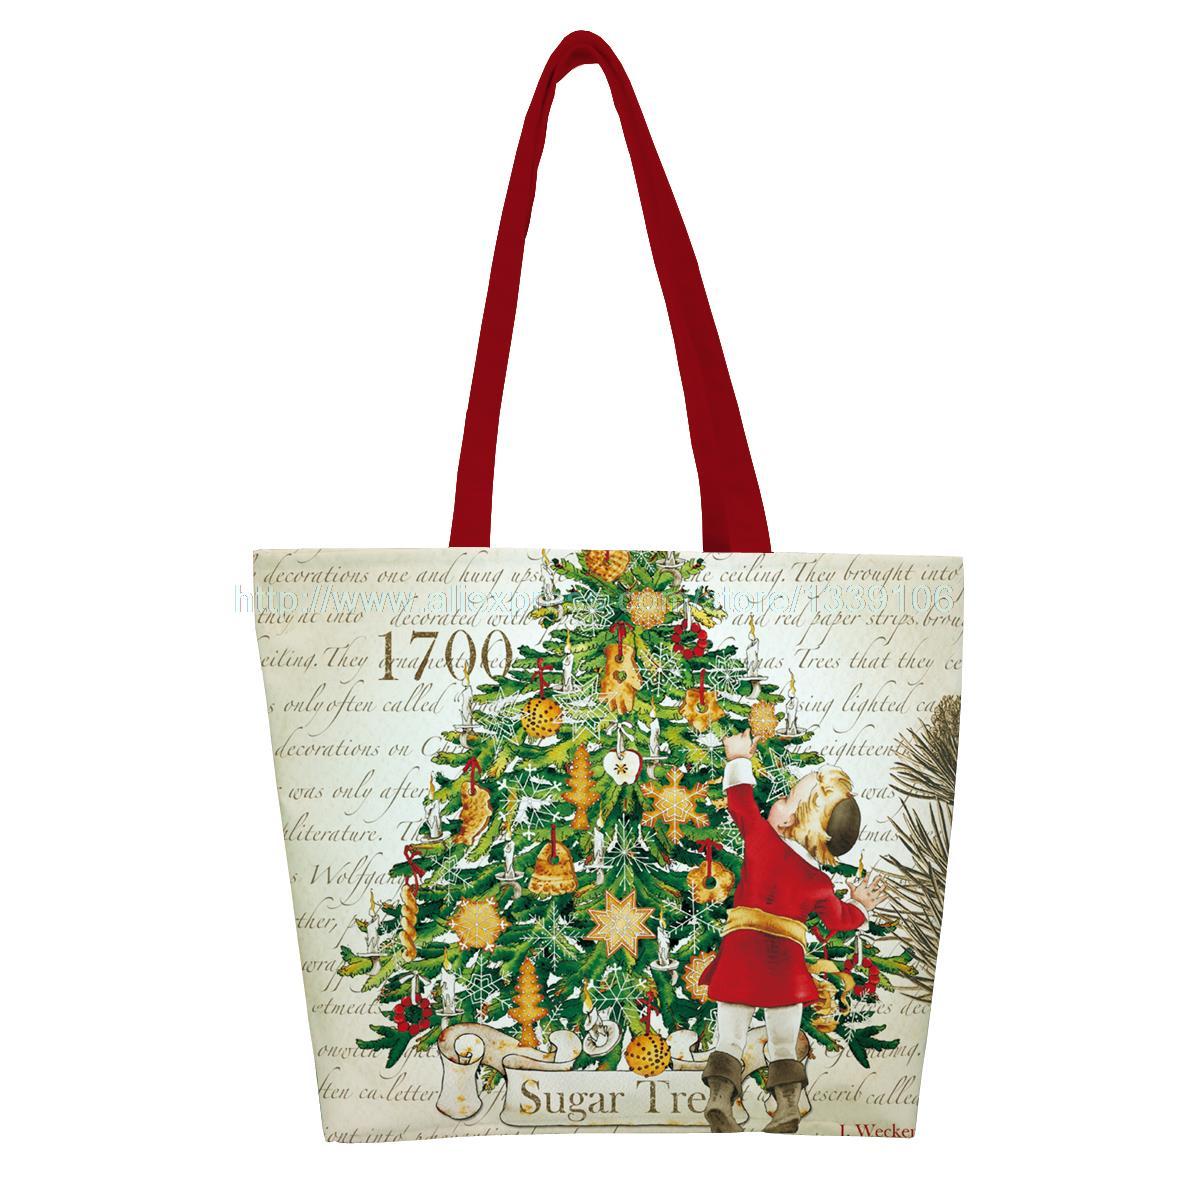 1PC kid pick up the sugar tree print christmas style custom reusable foldable Shopping Bag nylon handbag shoulder tote bags